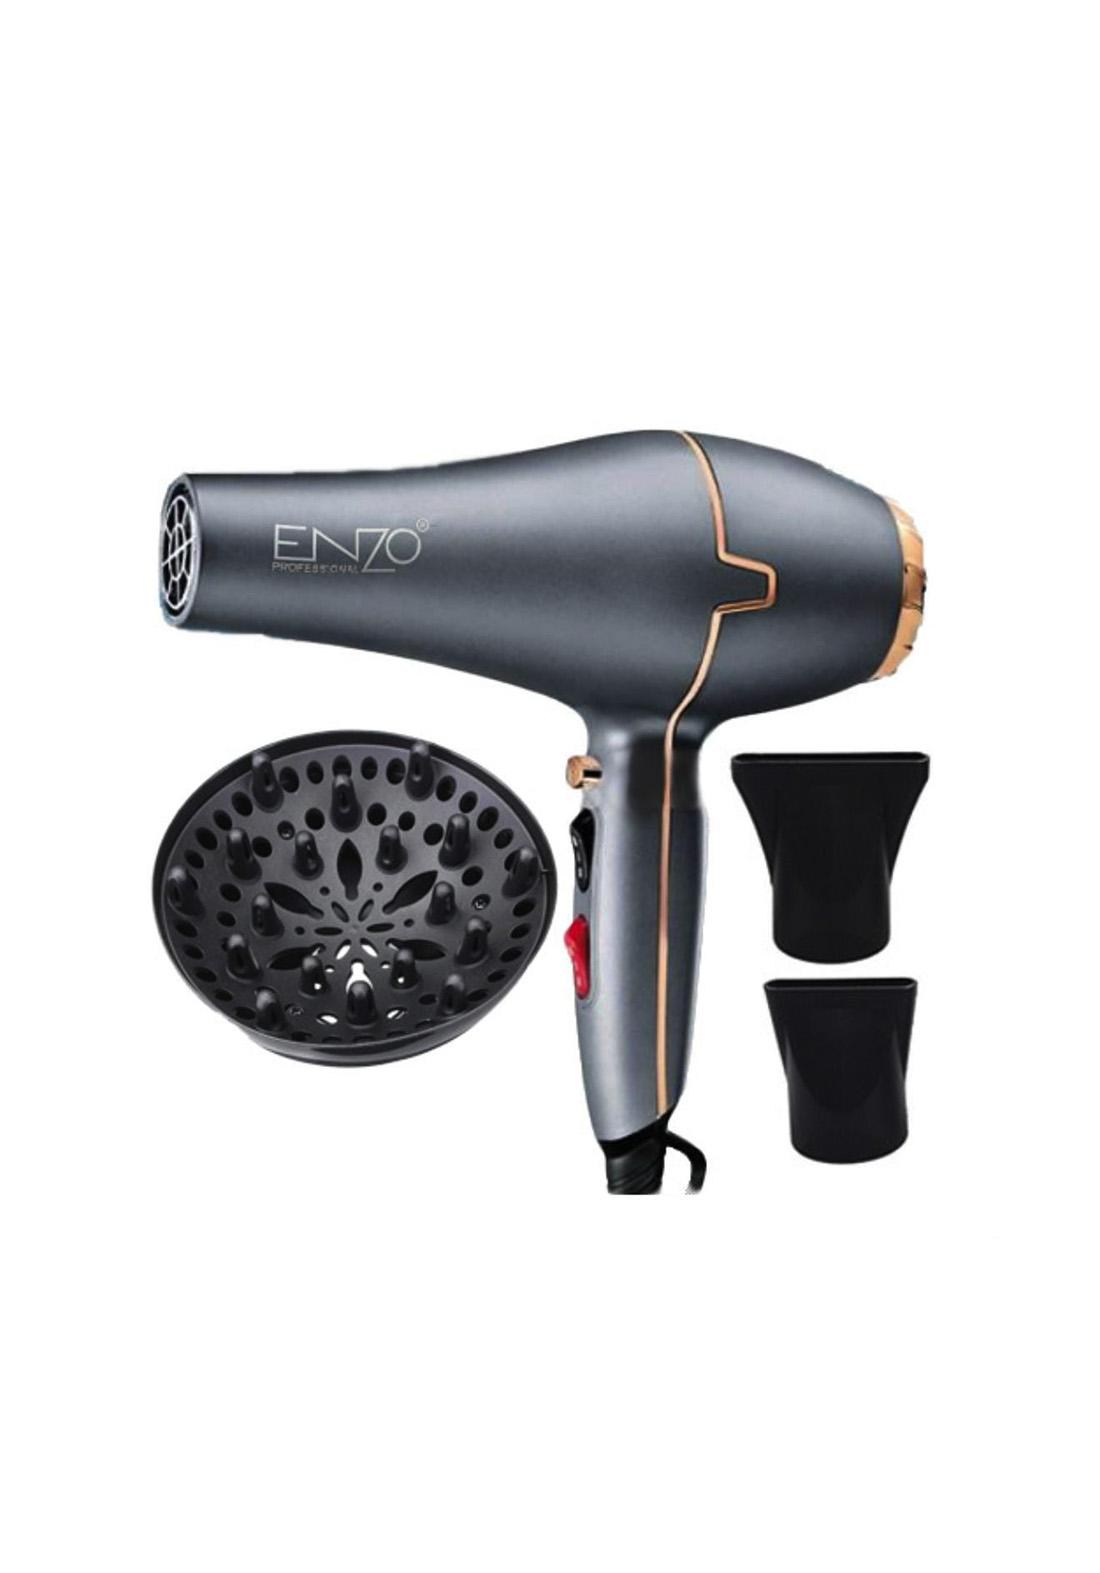 Enzo 6101 Professional Hair Dryer مجفف شعر